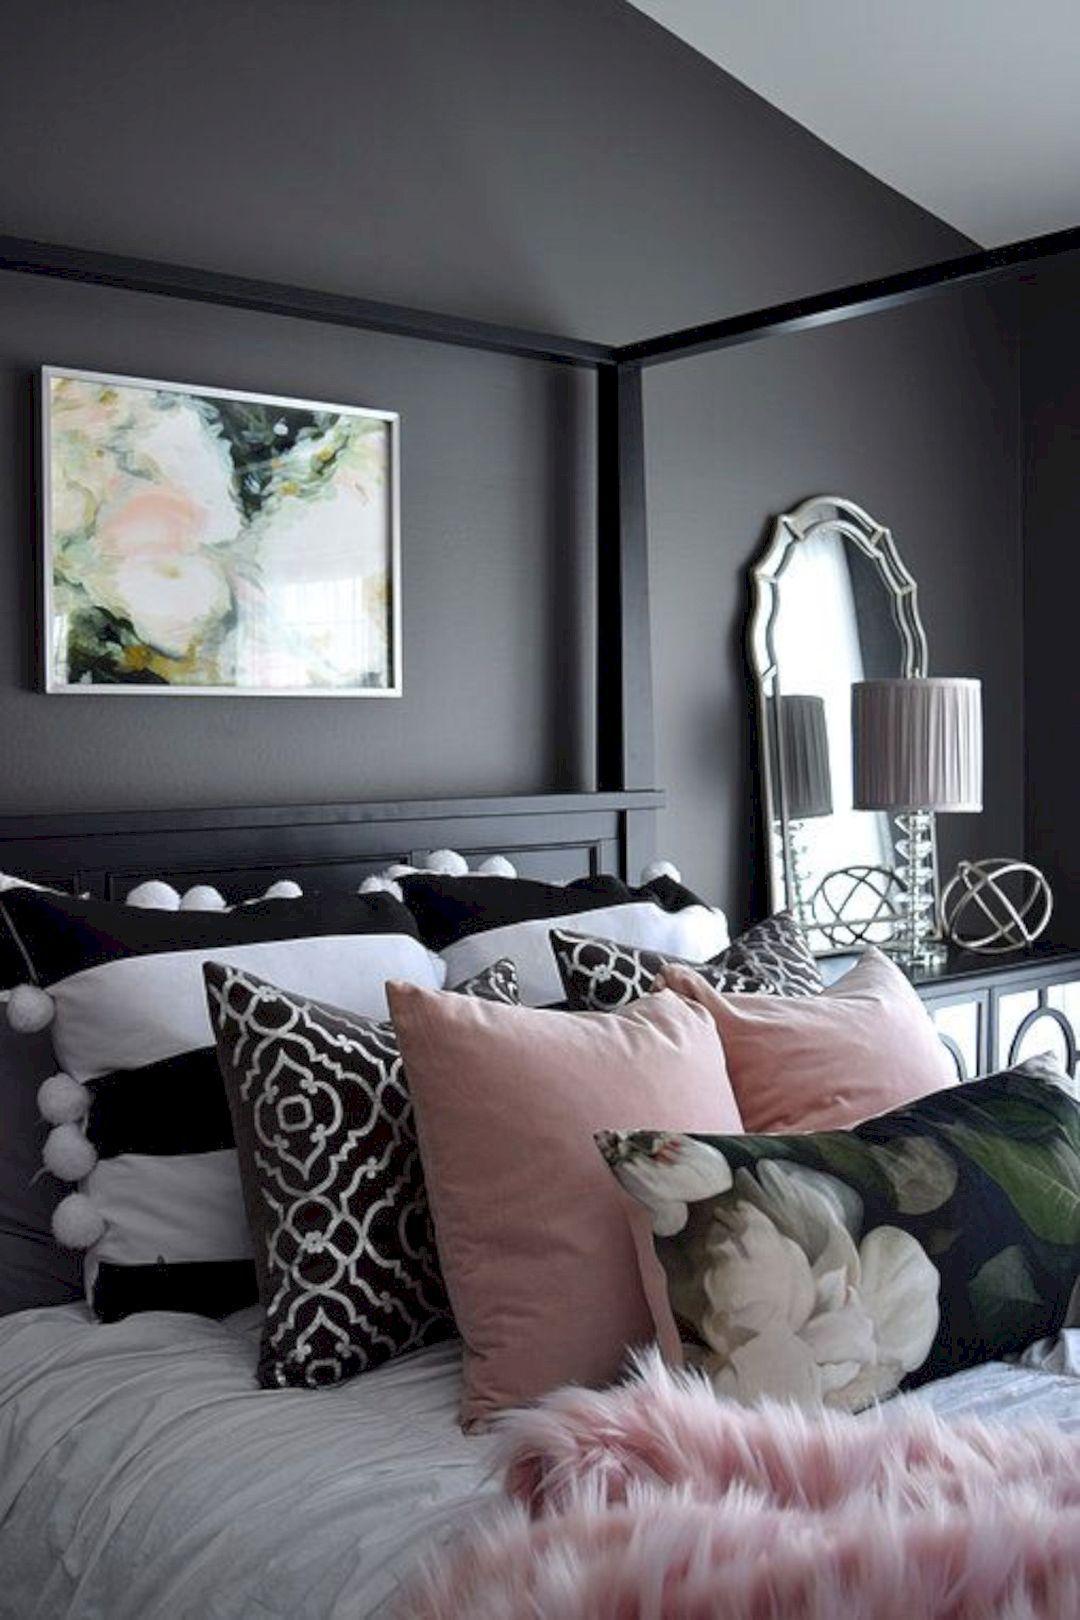 16 Awesome Black Furniture Bedroom Ideas Https Www Futuristarchitecture Com 32371 Black Furniture Bed Black Bedroom Furniture Bedroom Makeover Bedroom Design